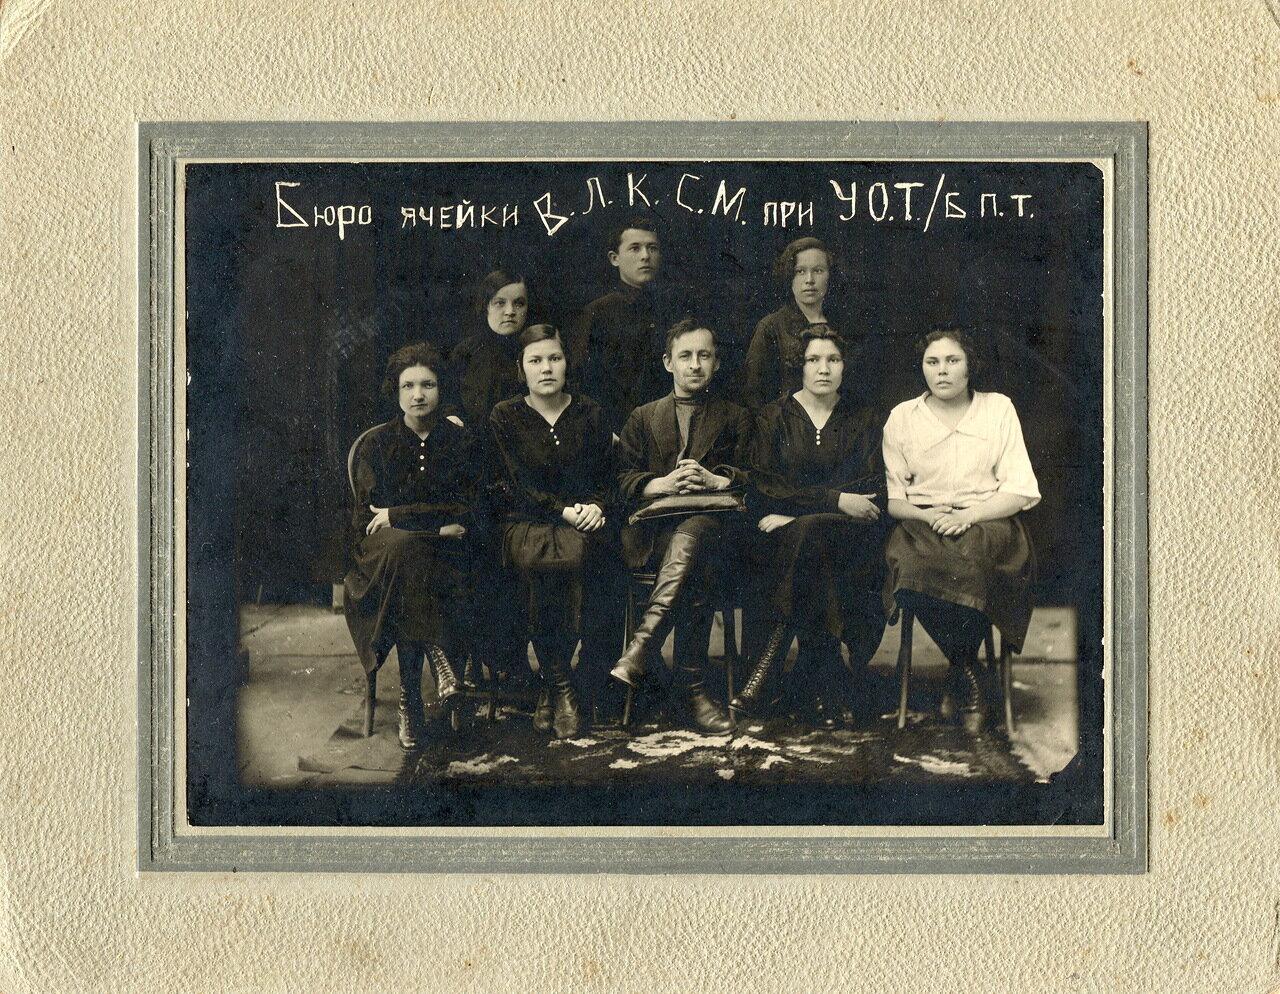 Бюро ячейки ВЛКСМ при УОТ. БПТ.